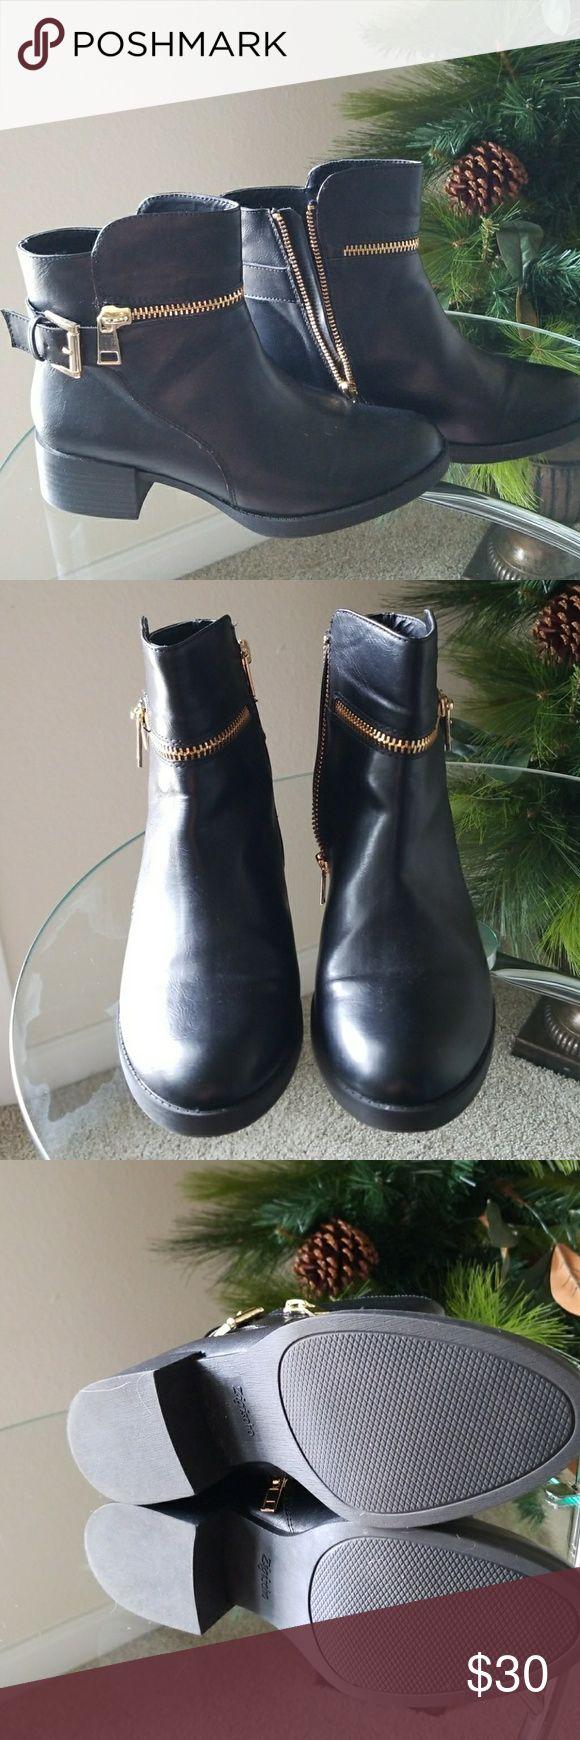 Moto boots NWOT - Super cool Moto boots never worn Zigi Soho Shoes Combat & Moto Boots